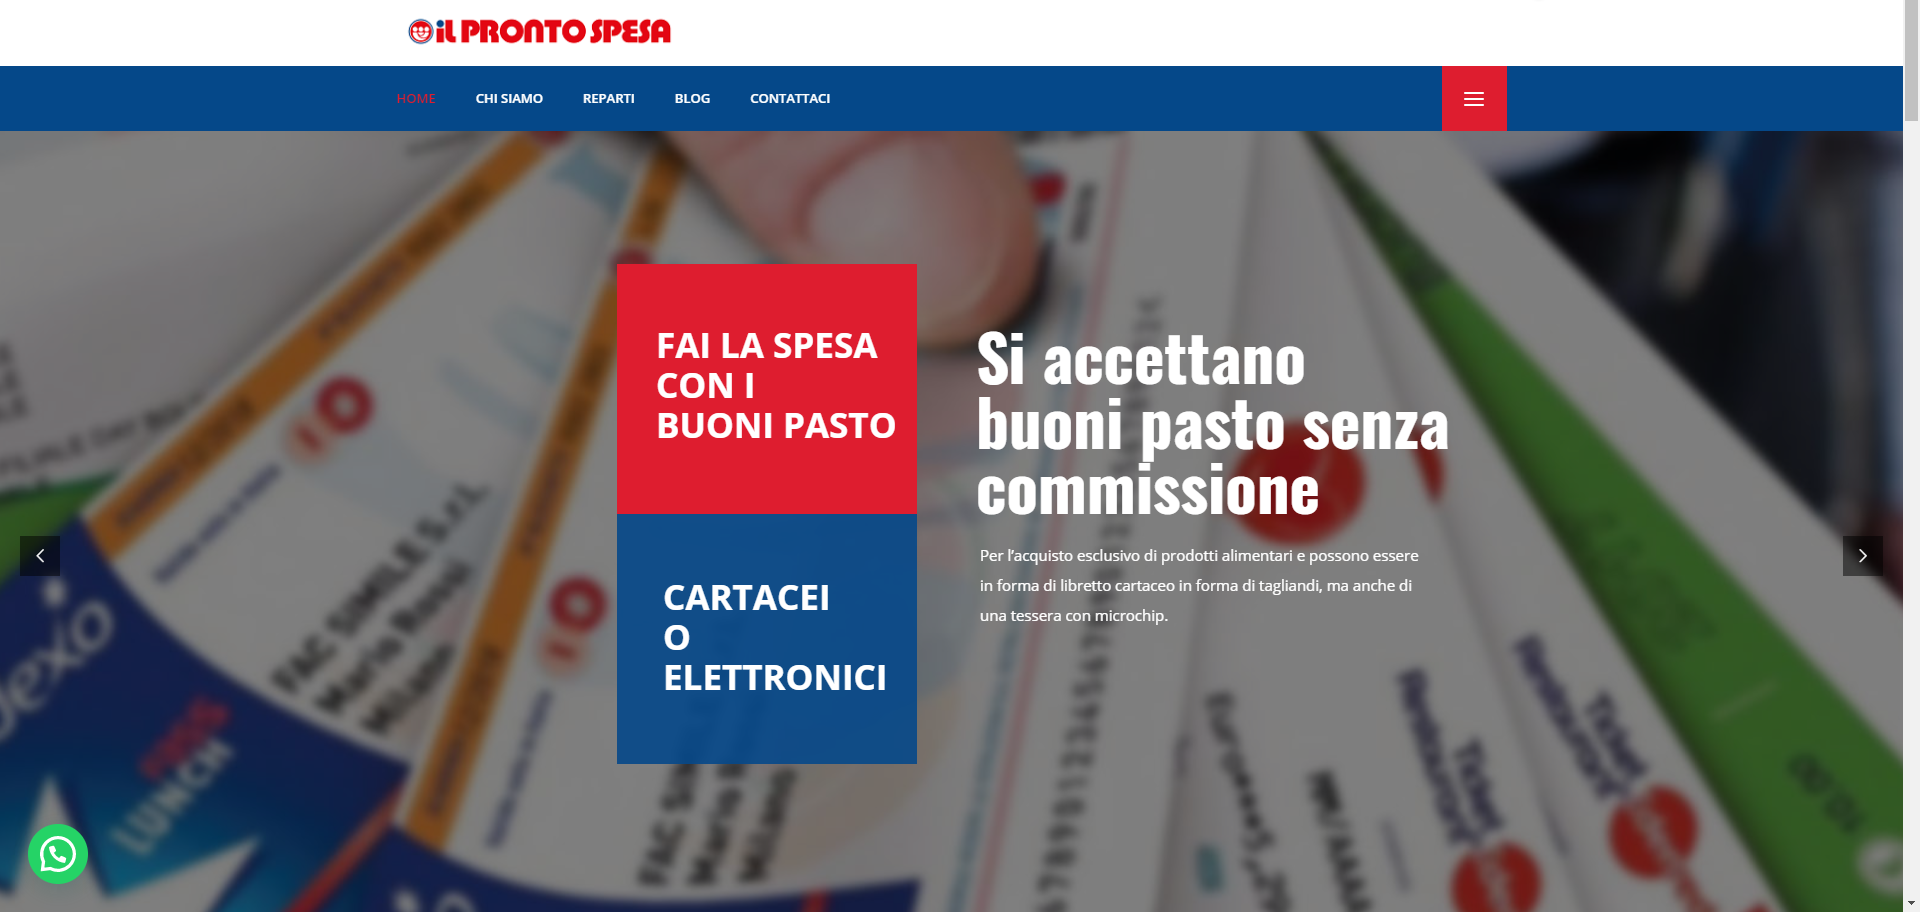 Home - Il Pronto Spesa - Google Chrome 16_04_2021 20_27_30